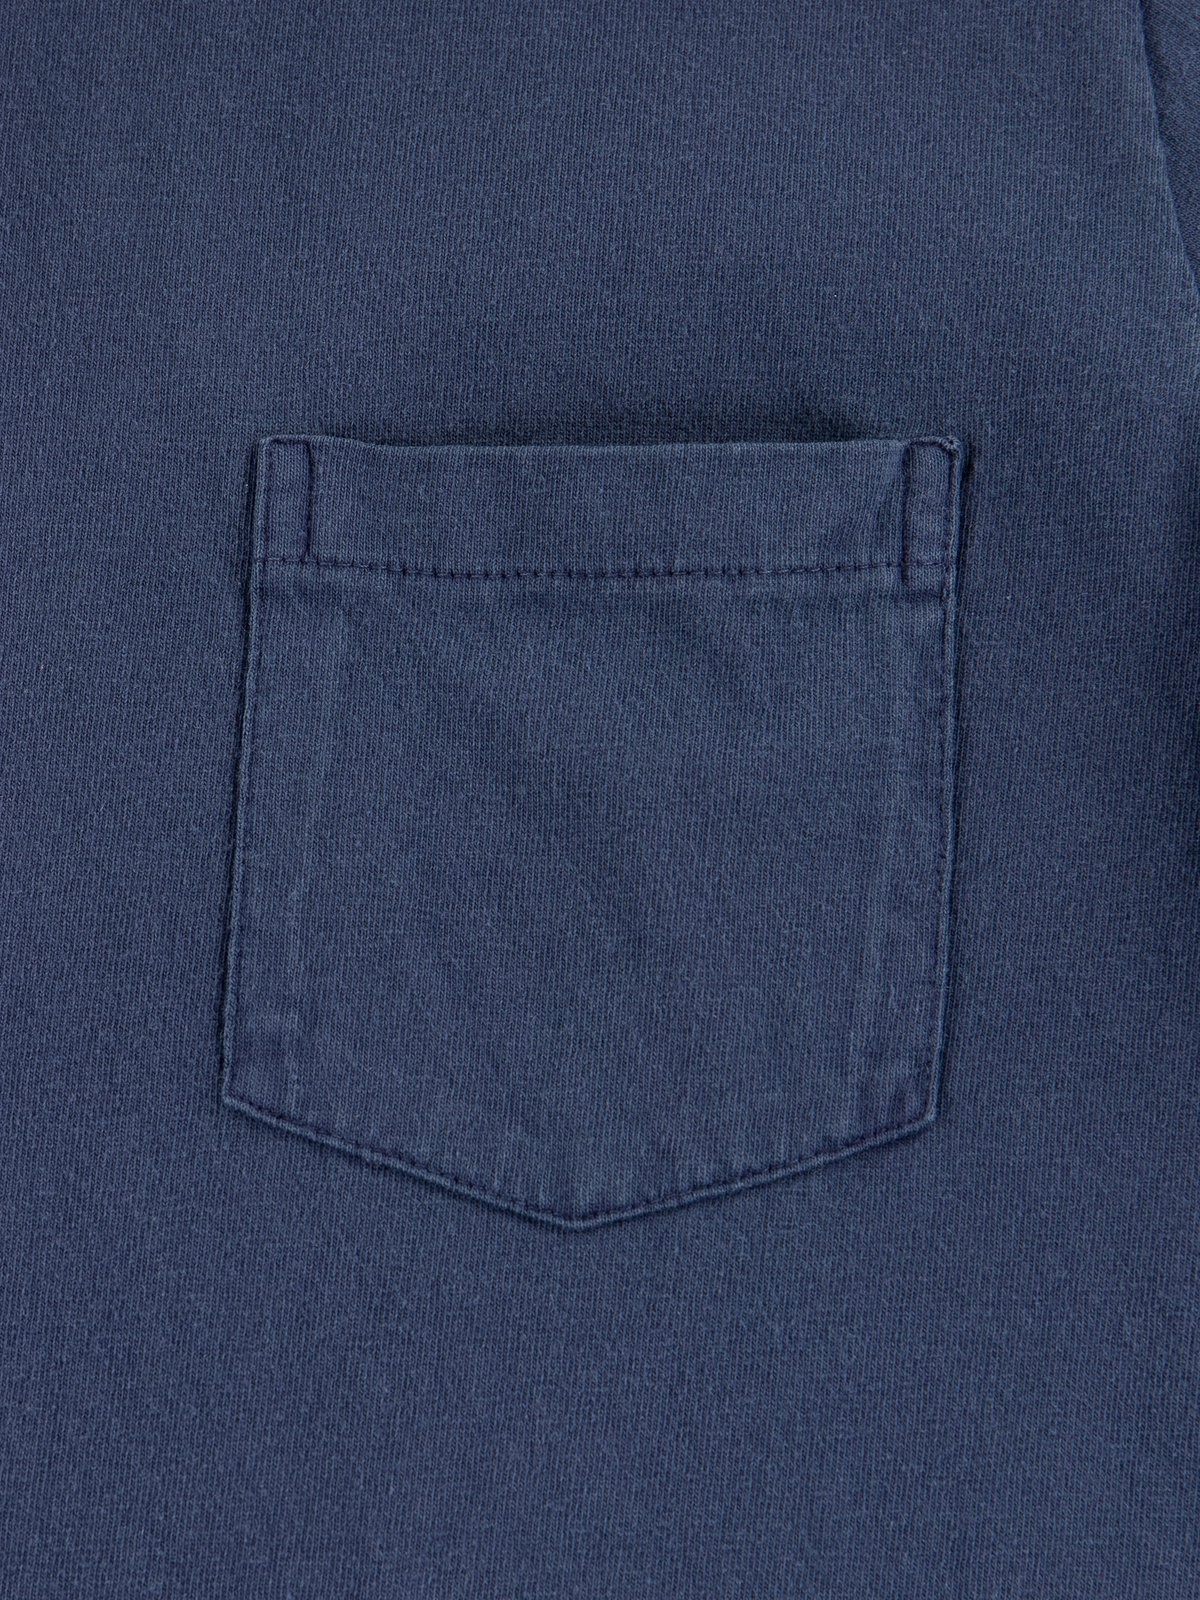 Navy Pigment Dye Pocket Tee - Image 3